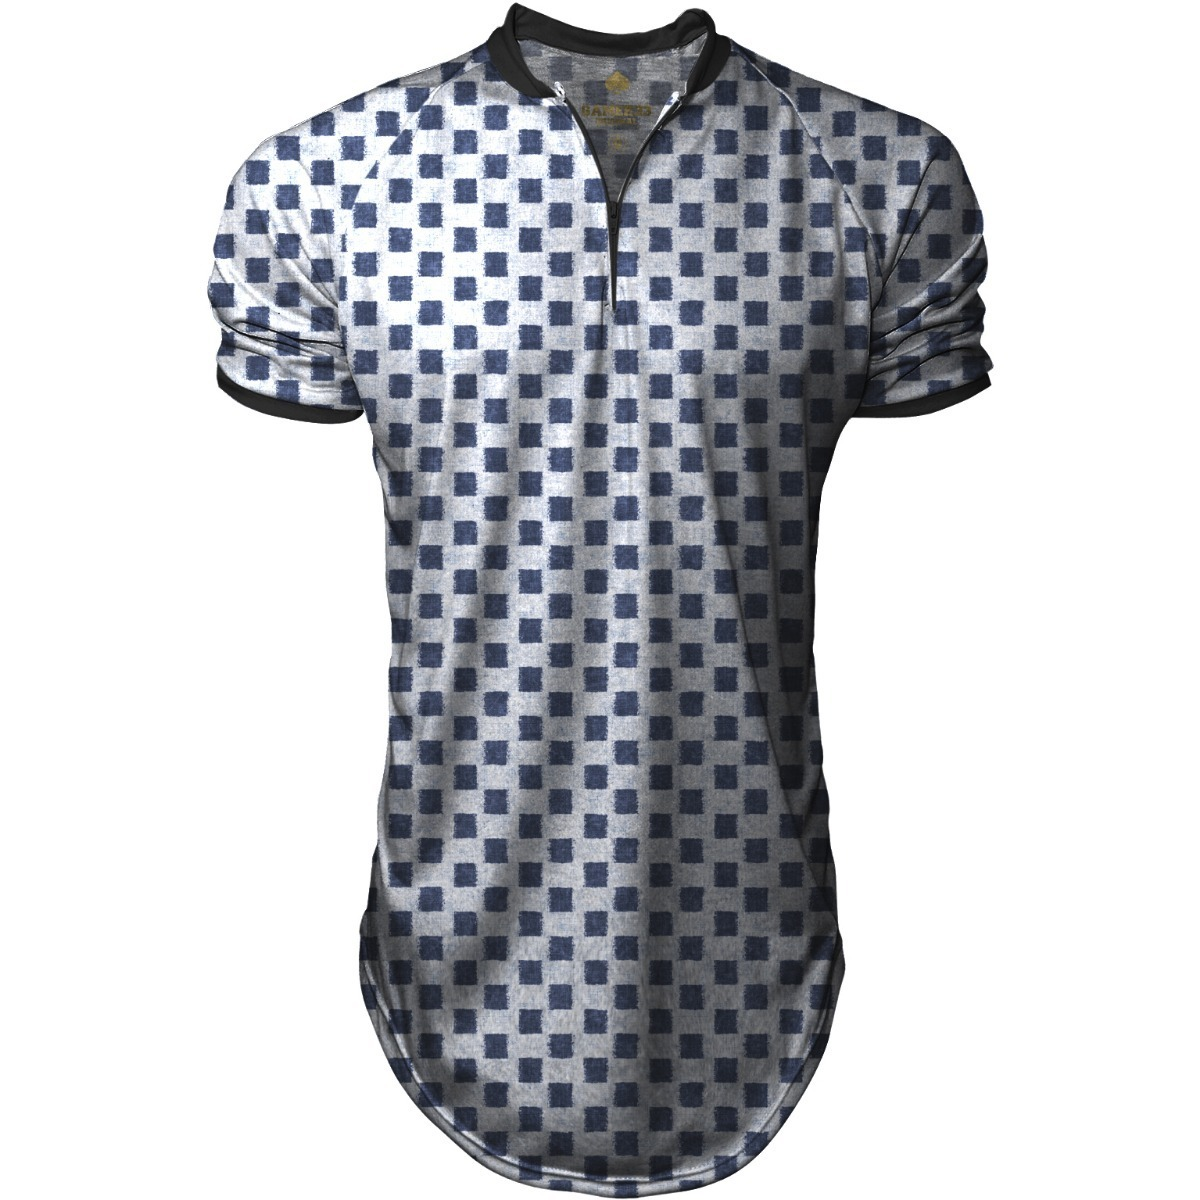 e365c320dc7ec camiseta masculina oversized longline gola polo sport xadrez. Carregando  zoom.